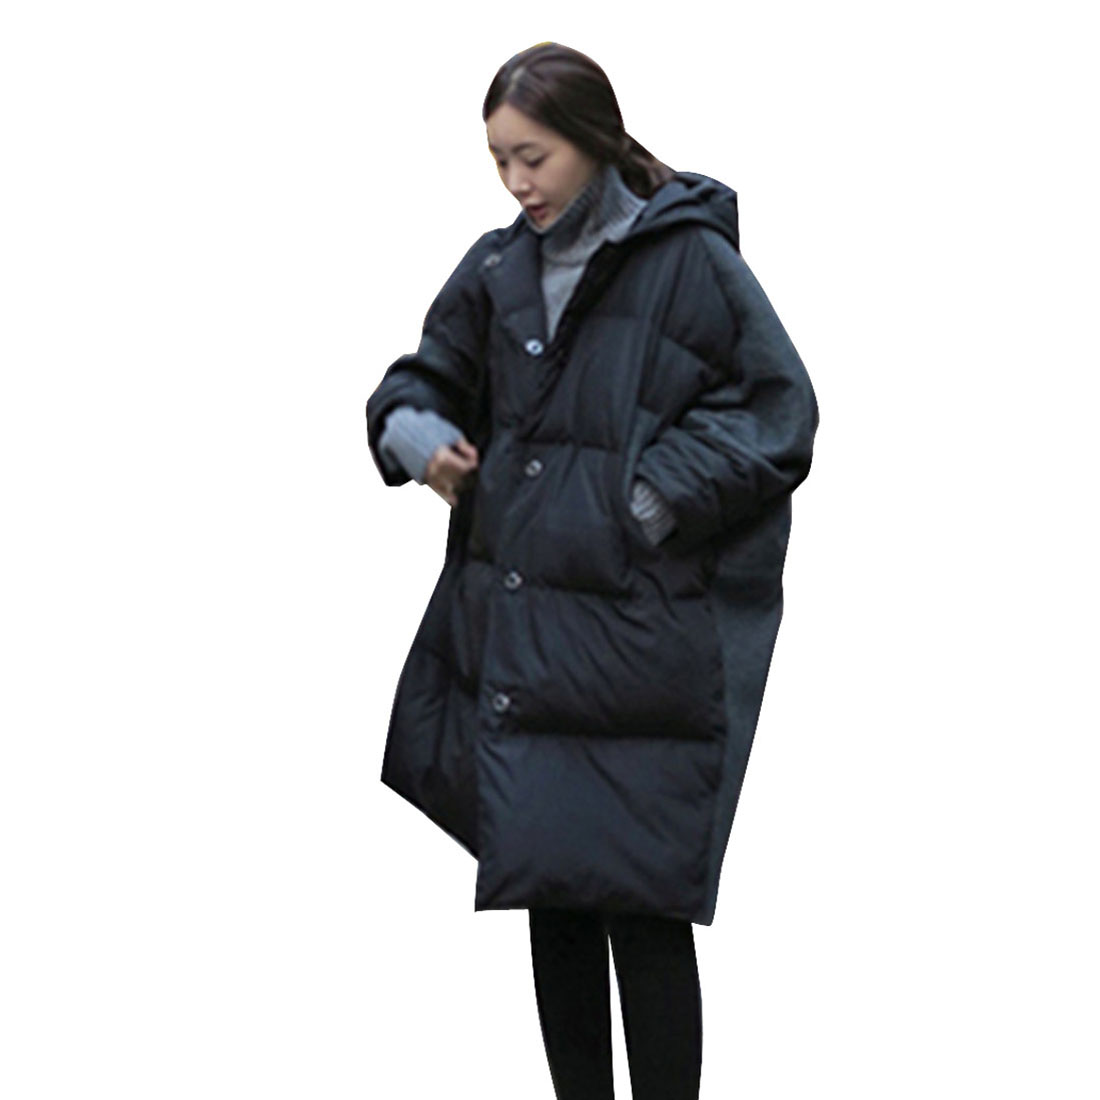 Winter Women Long Sleeves Black Warm Overcoat Female Autumn Eiderdown cotton Loose Coats lady Fashion Outwear